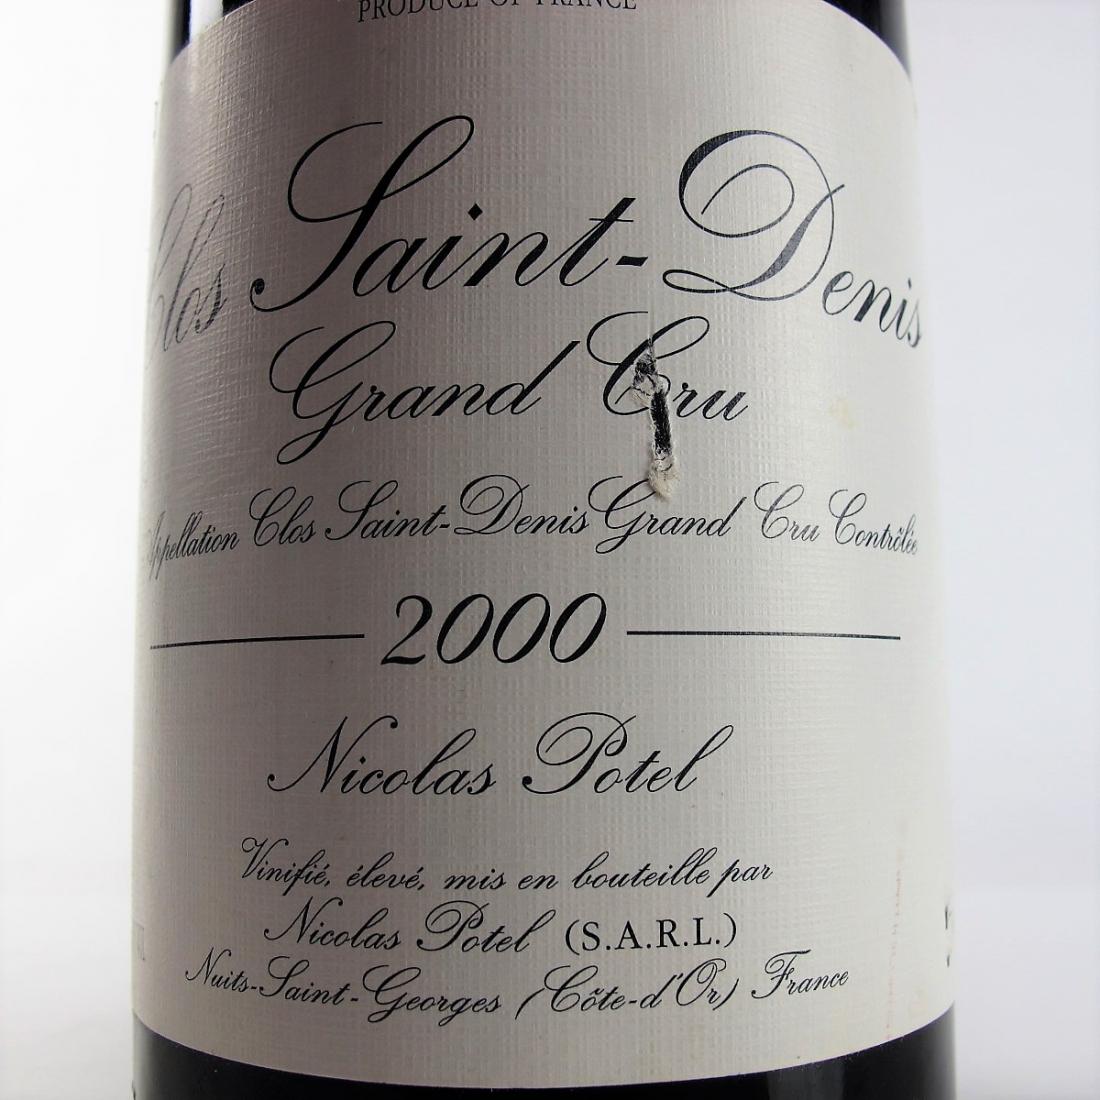 N.Potel 2000 Clos Saint-Denis Grand-Cru